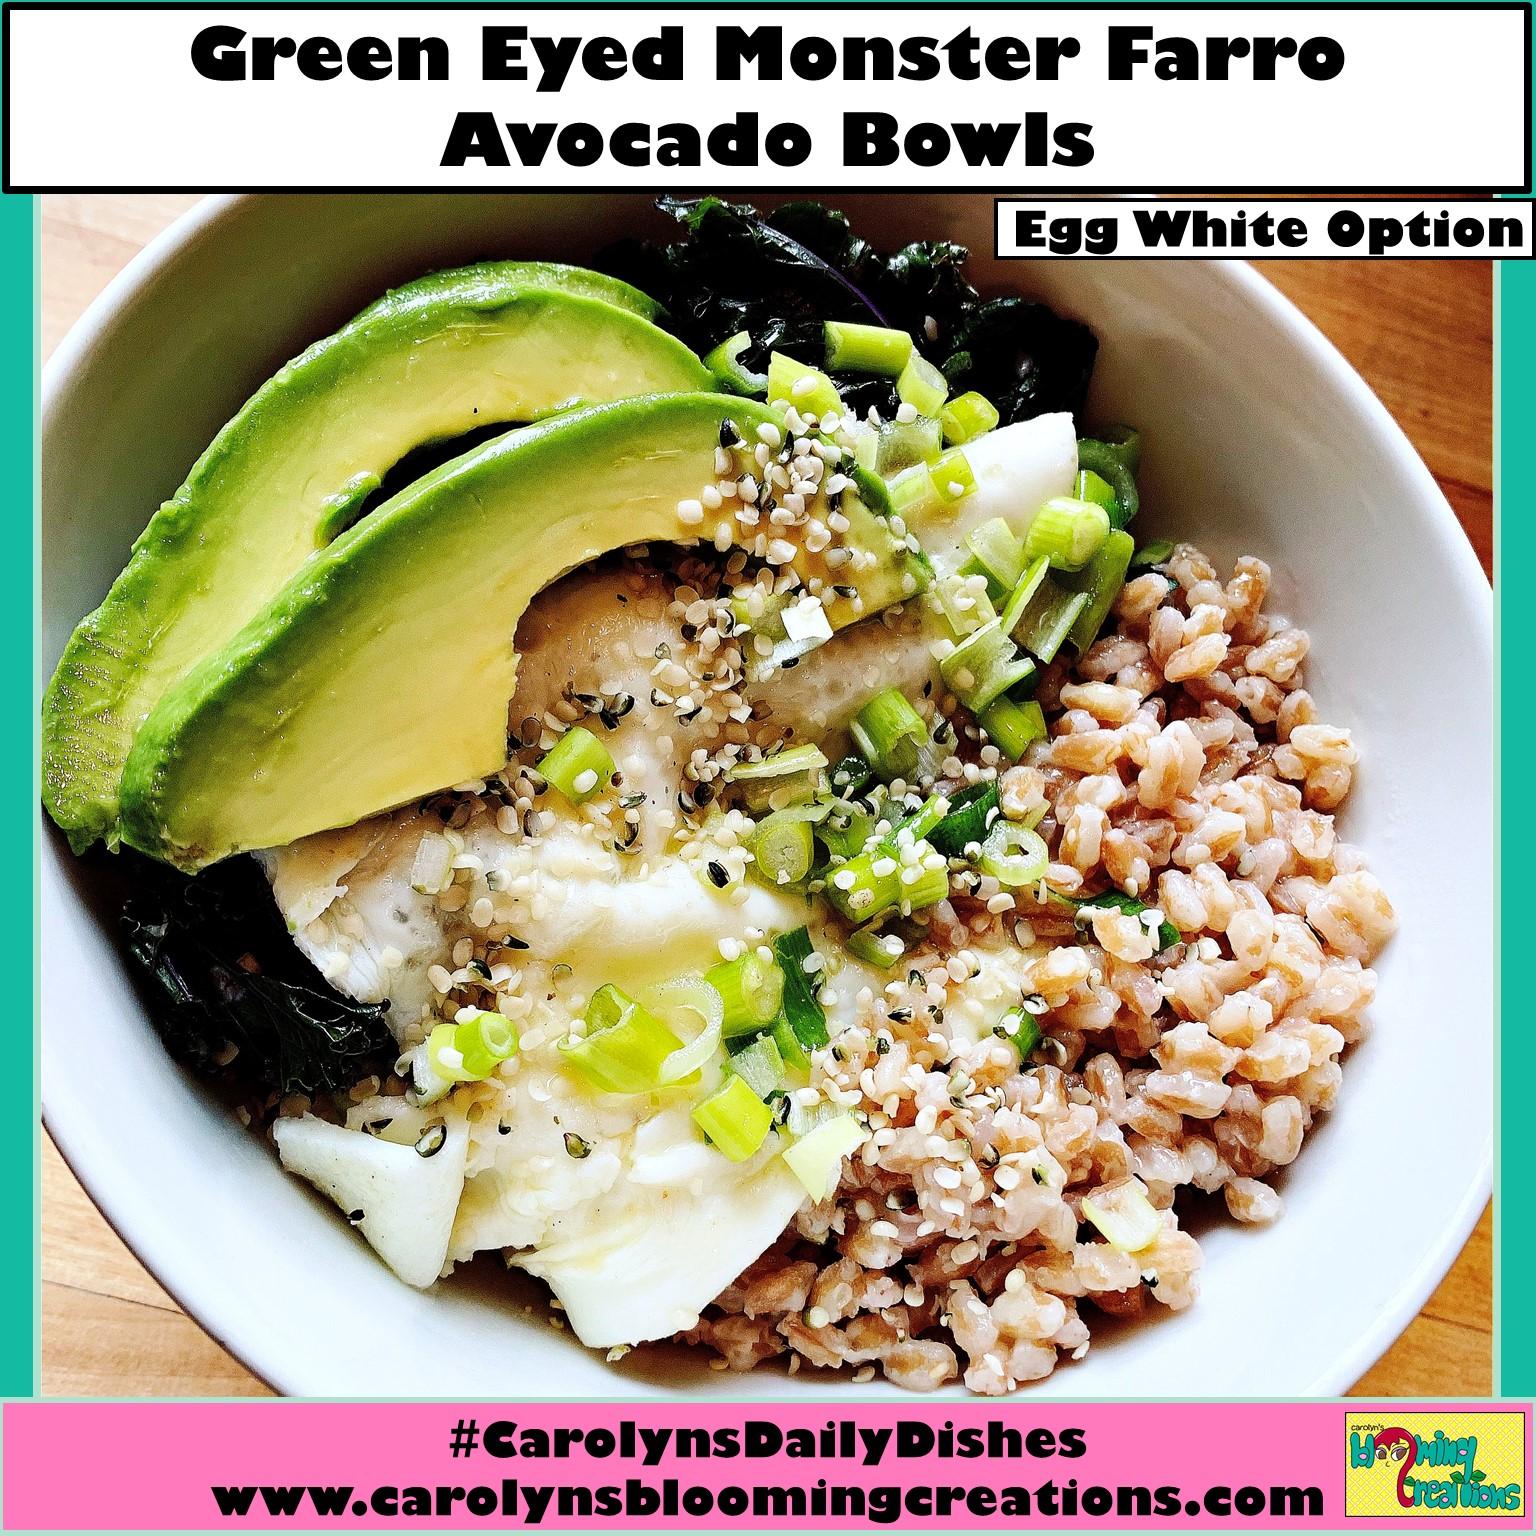 Recipe, food preparation, styling, photography by Carolyn J. Braden  Pin me! www.carolynsbloomingcreations.com